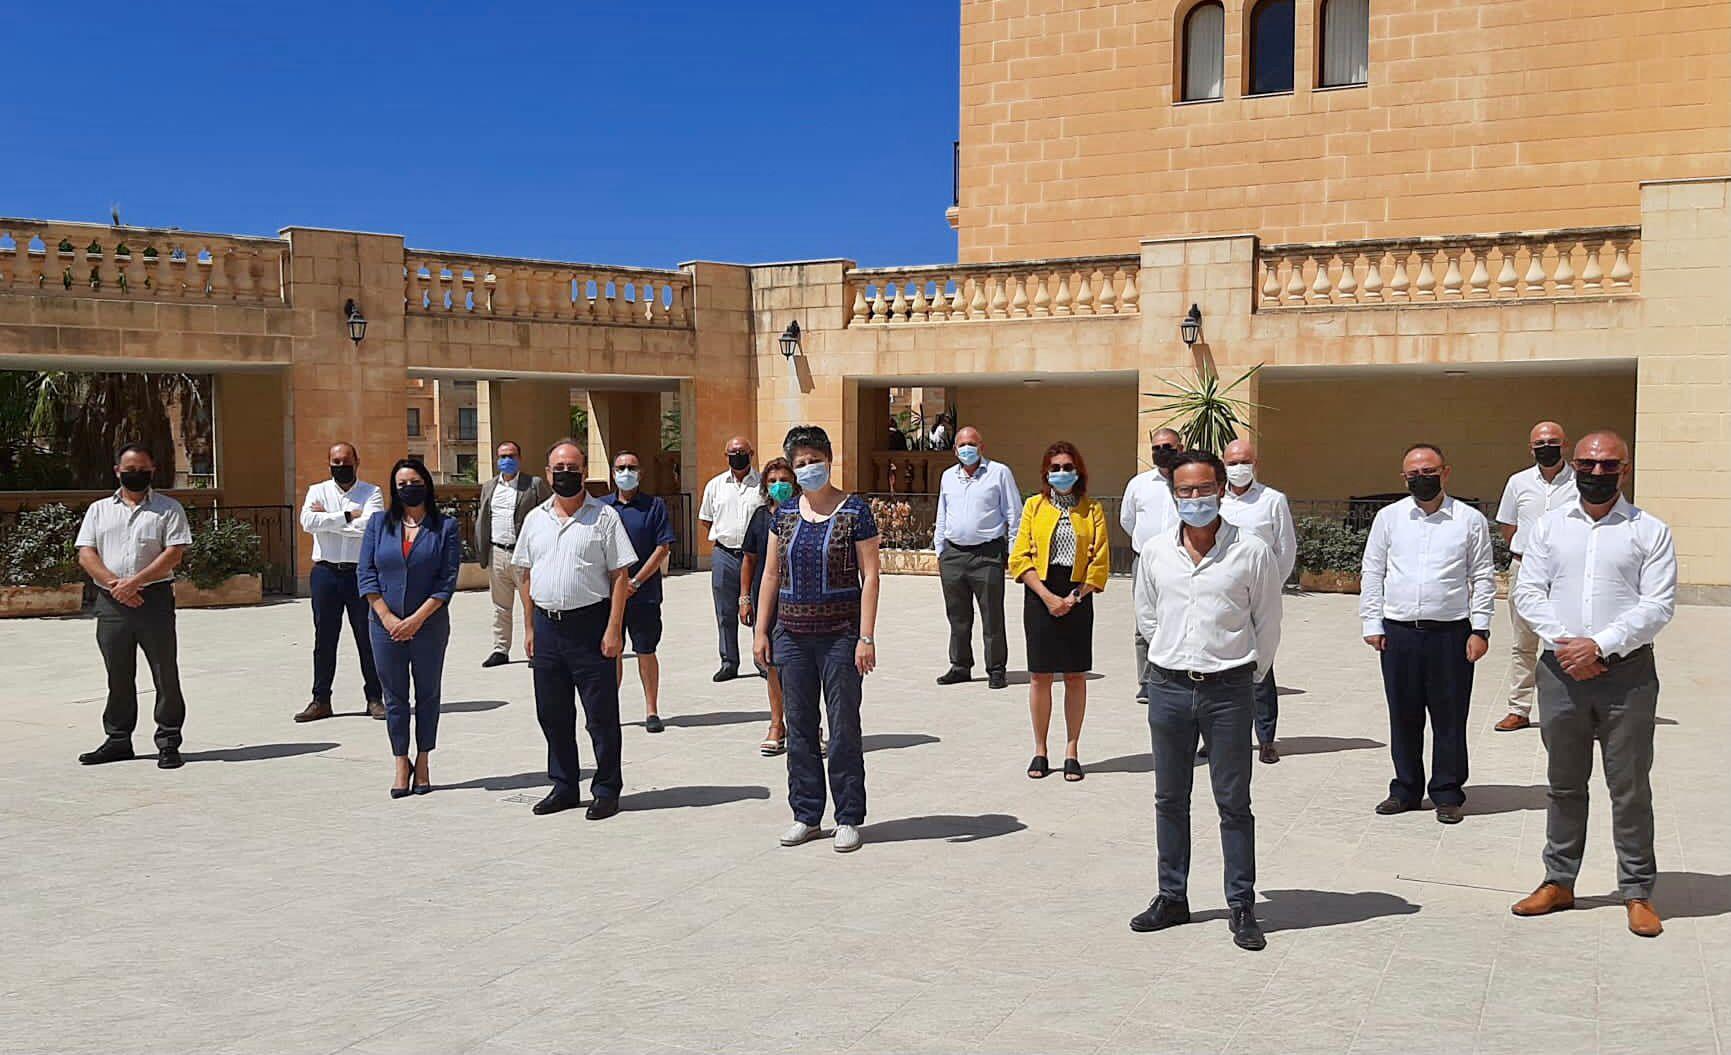 Malta and Gozo chambers